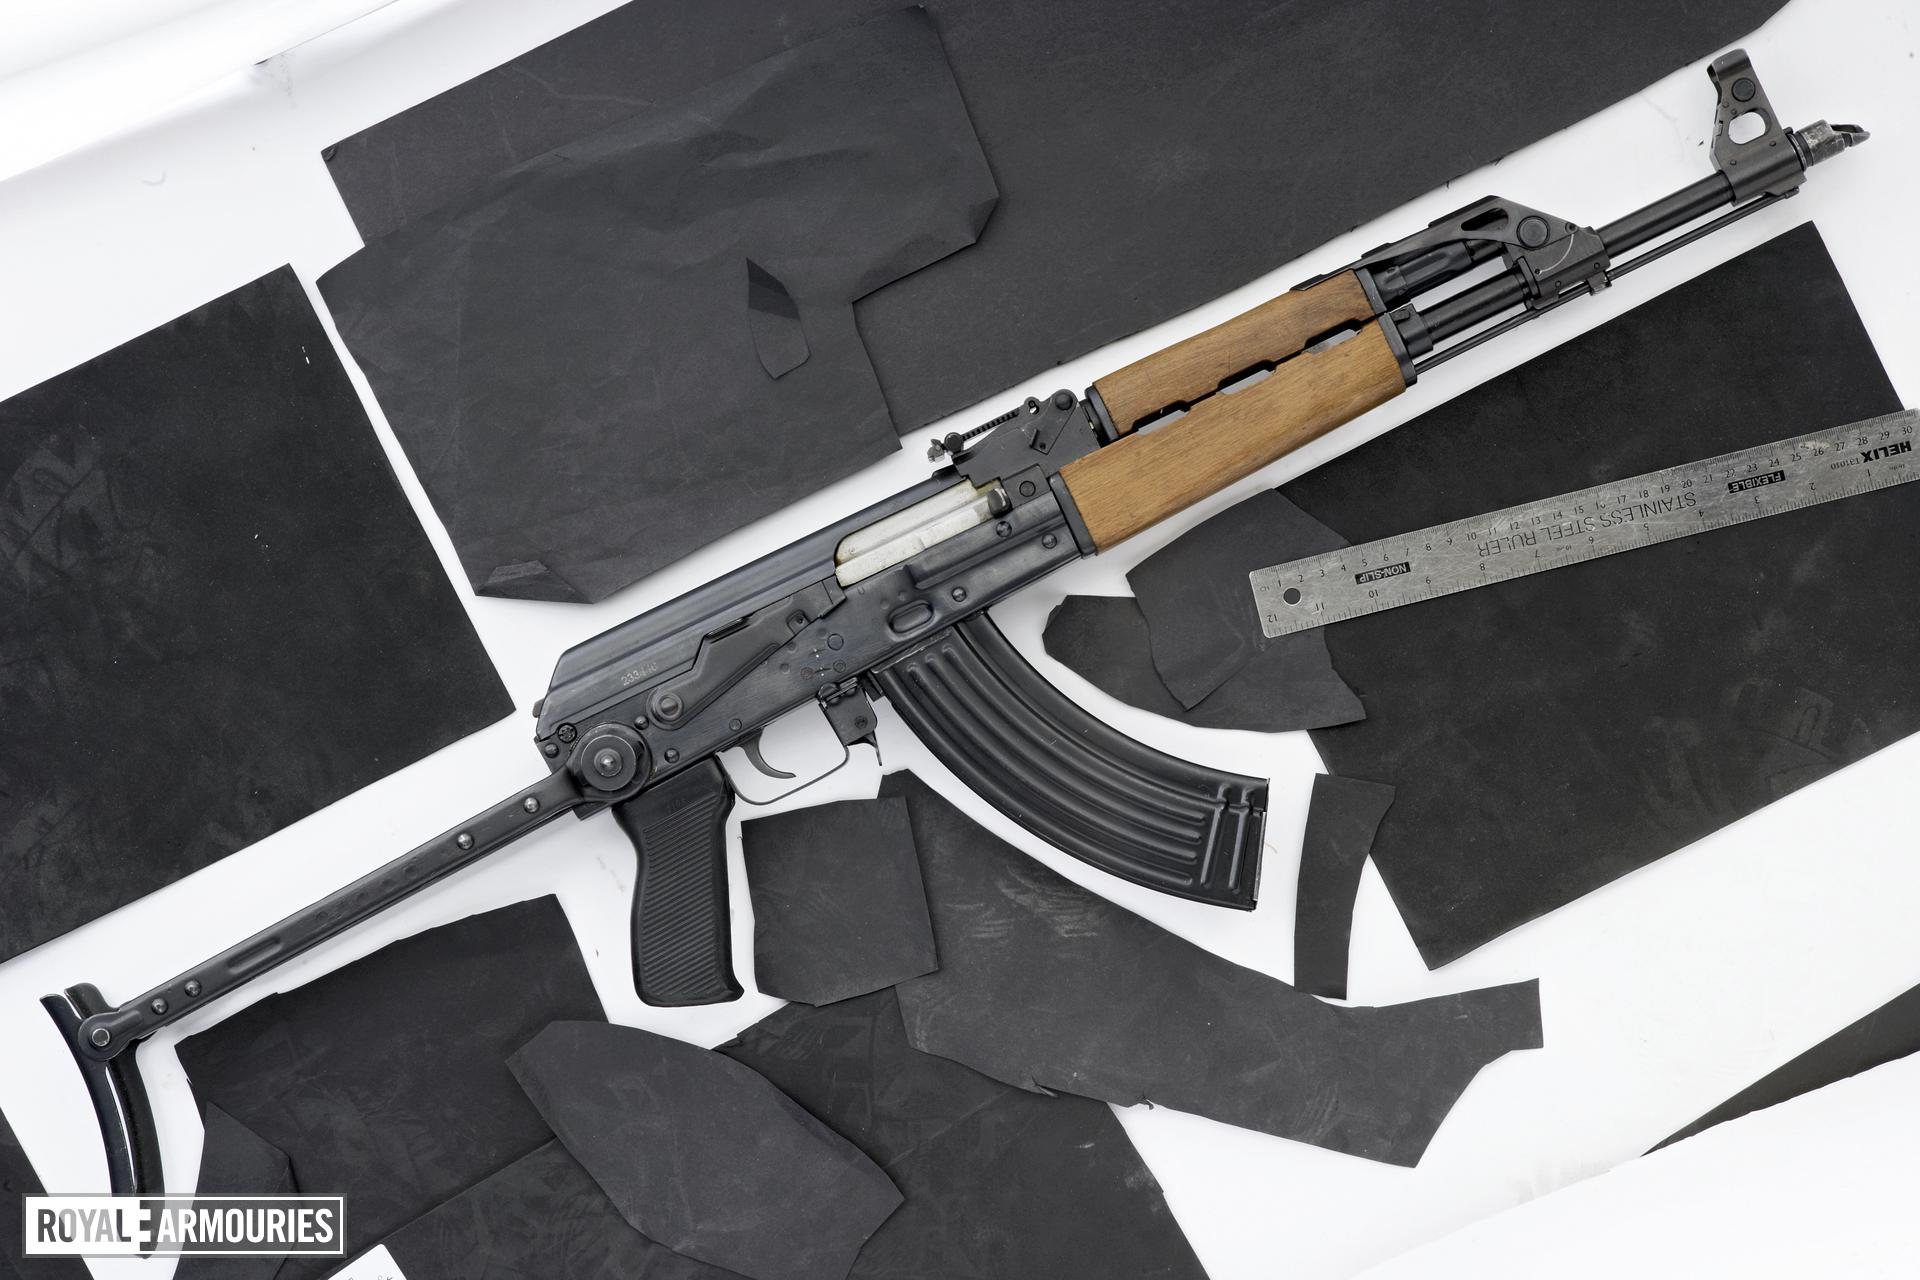 Centrefire automatic rifle - M70AB2 (Kalashnikov)